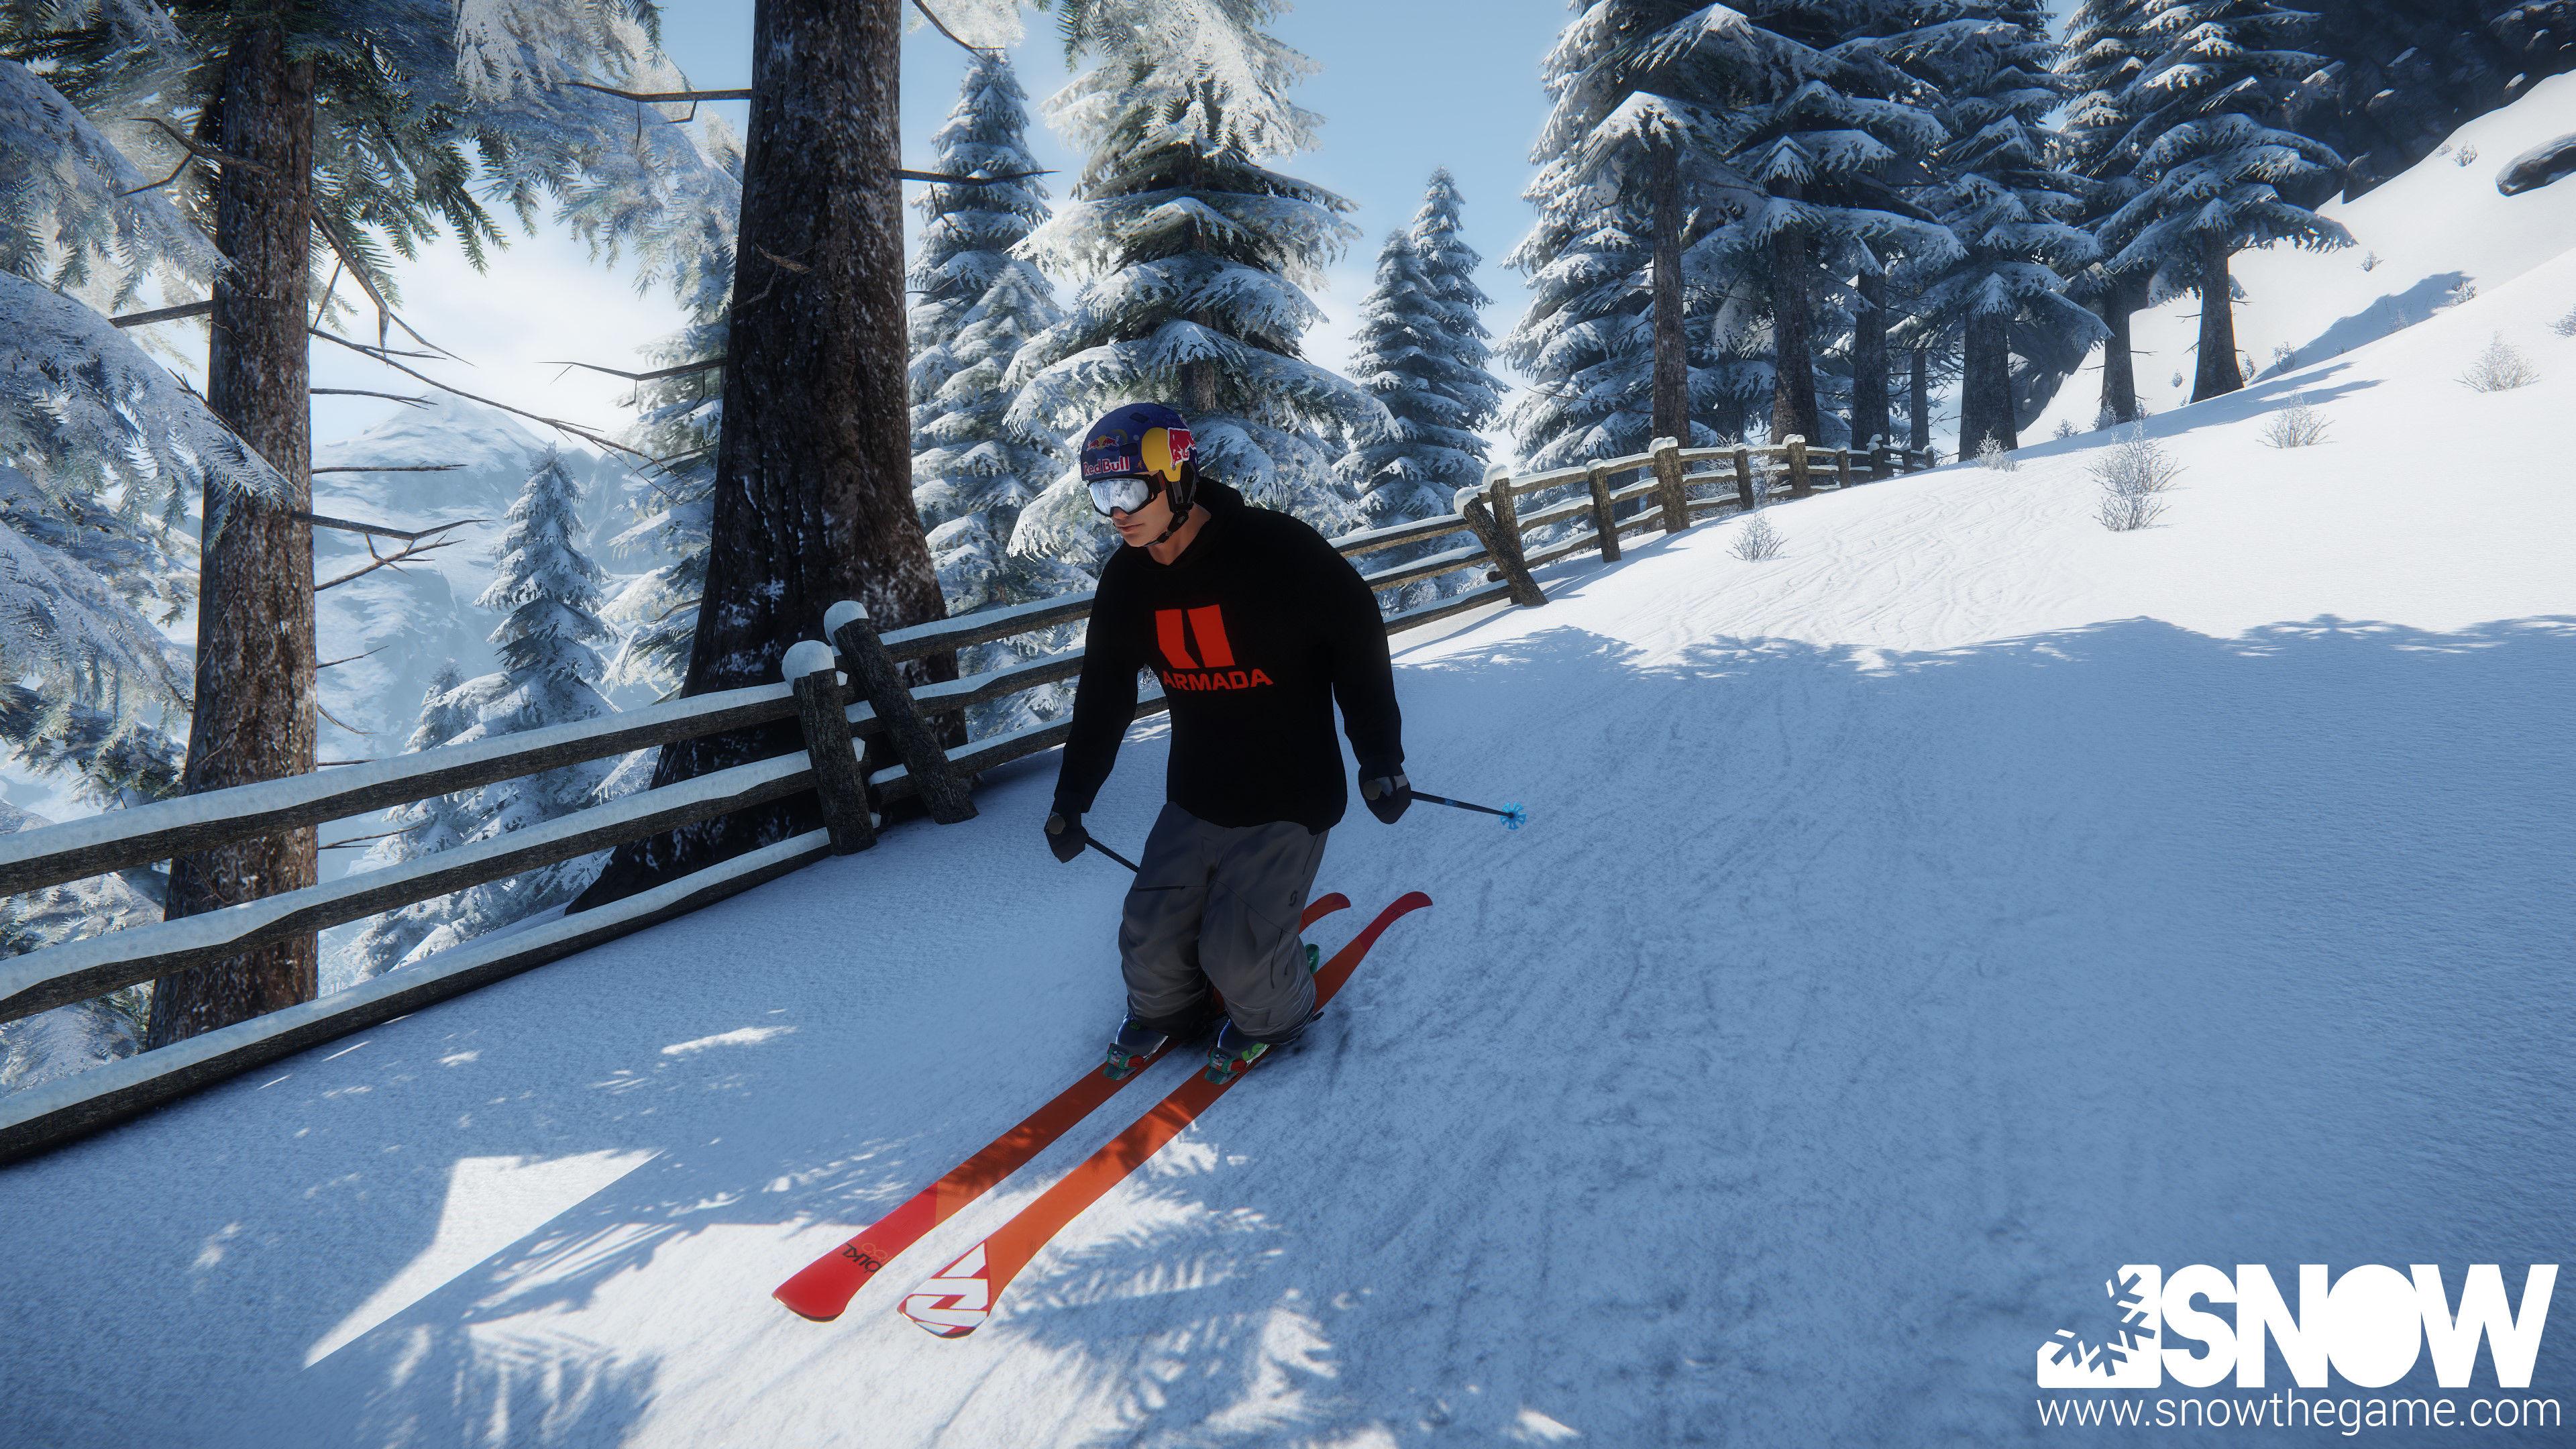 Nové obrázky z adrenalinového SNOW 88119